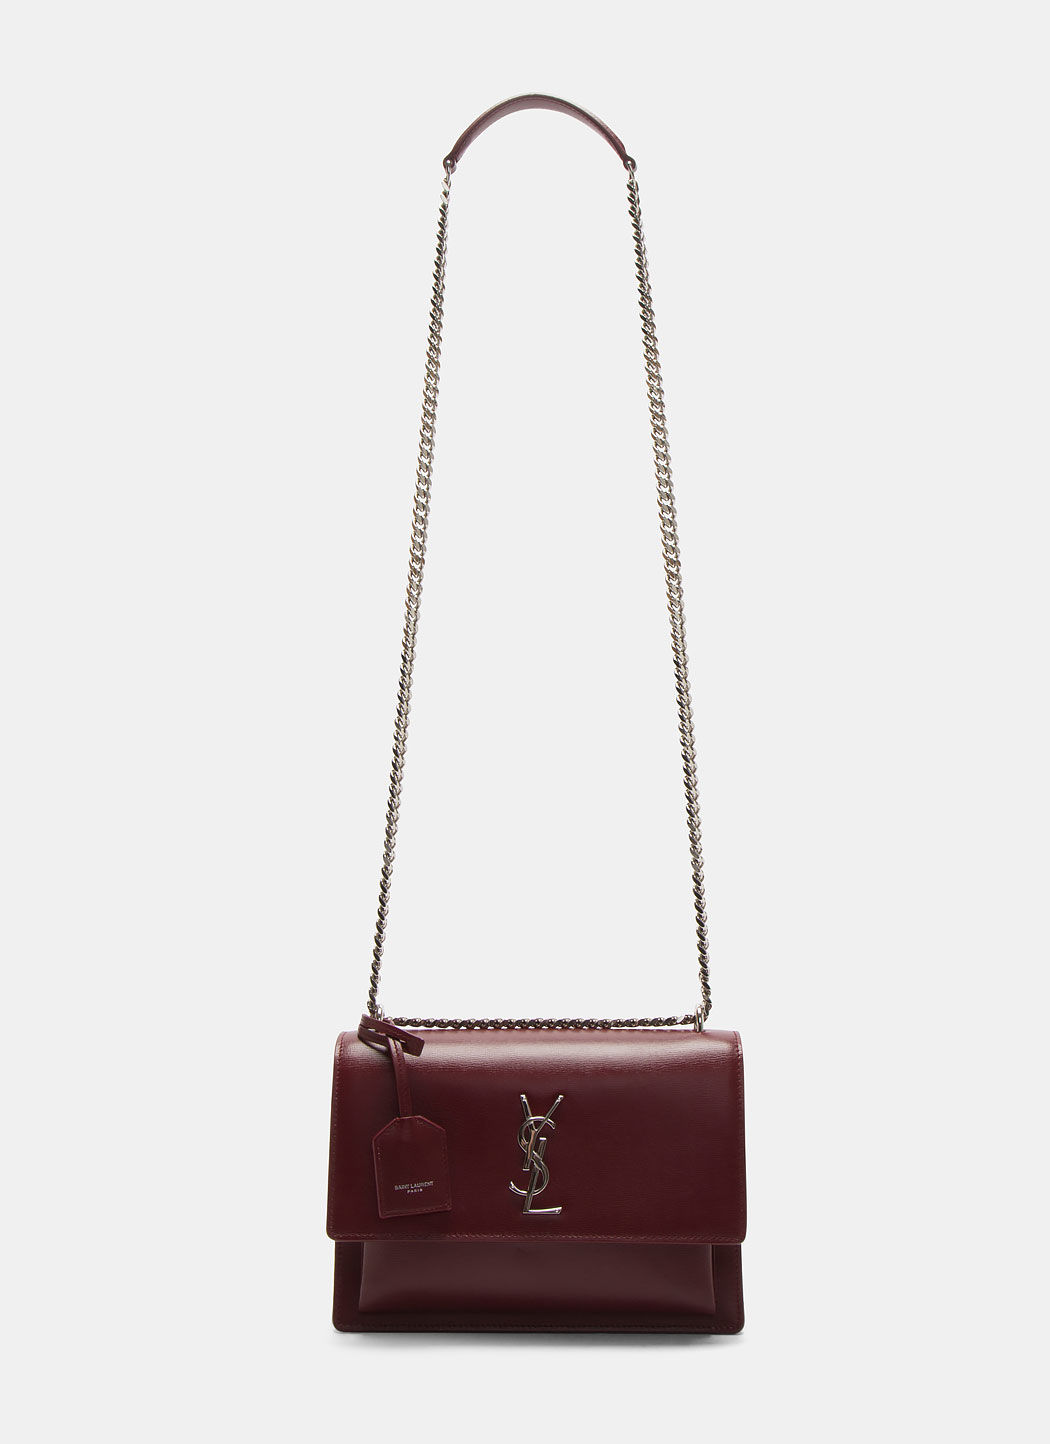 Saint Laurent Medium Sunset Calfskin Shoulder Bag - Burgundy In Red ... c0e3ff775561f